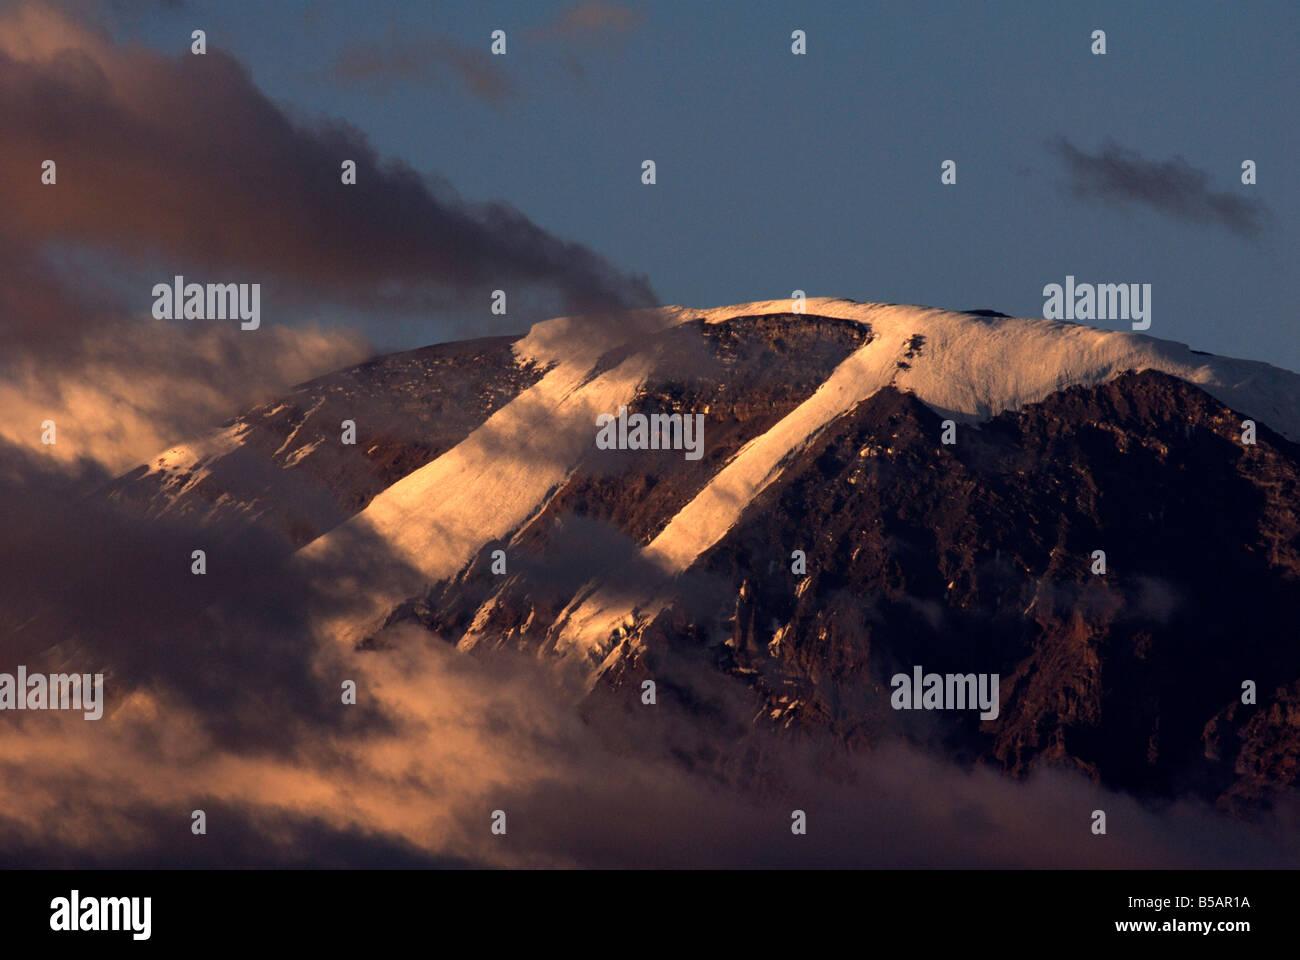 Mount Kilimanjaro, Tanzania, East Africa, Africa - Stock Image